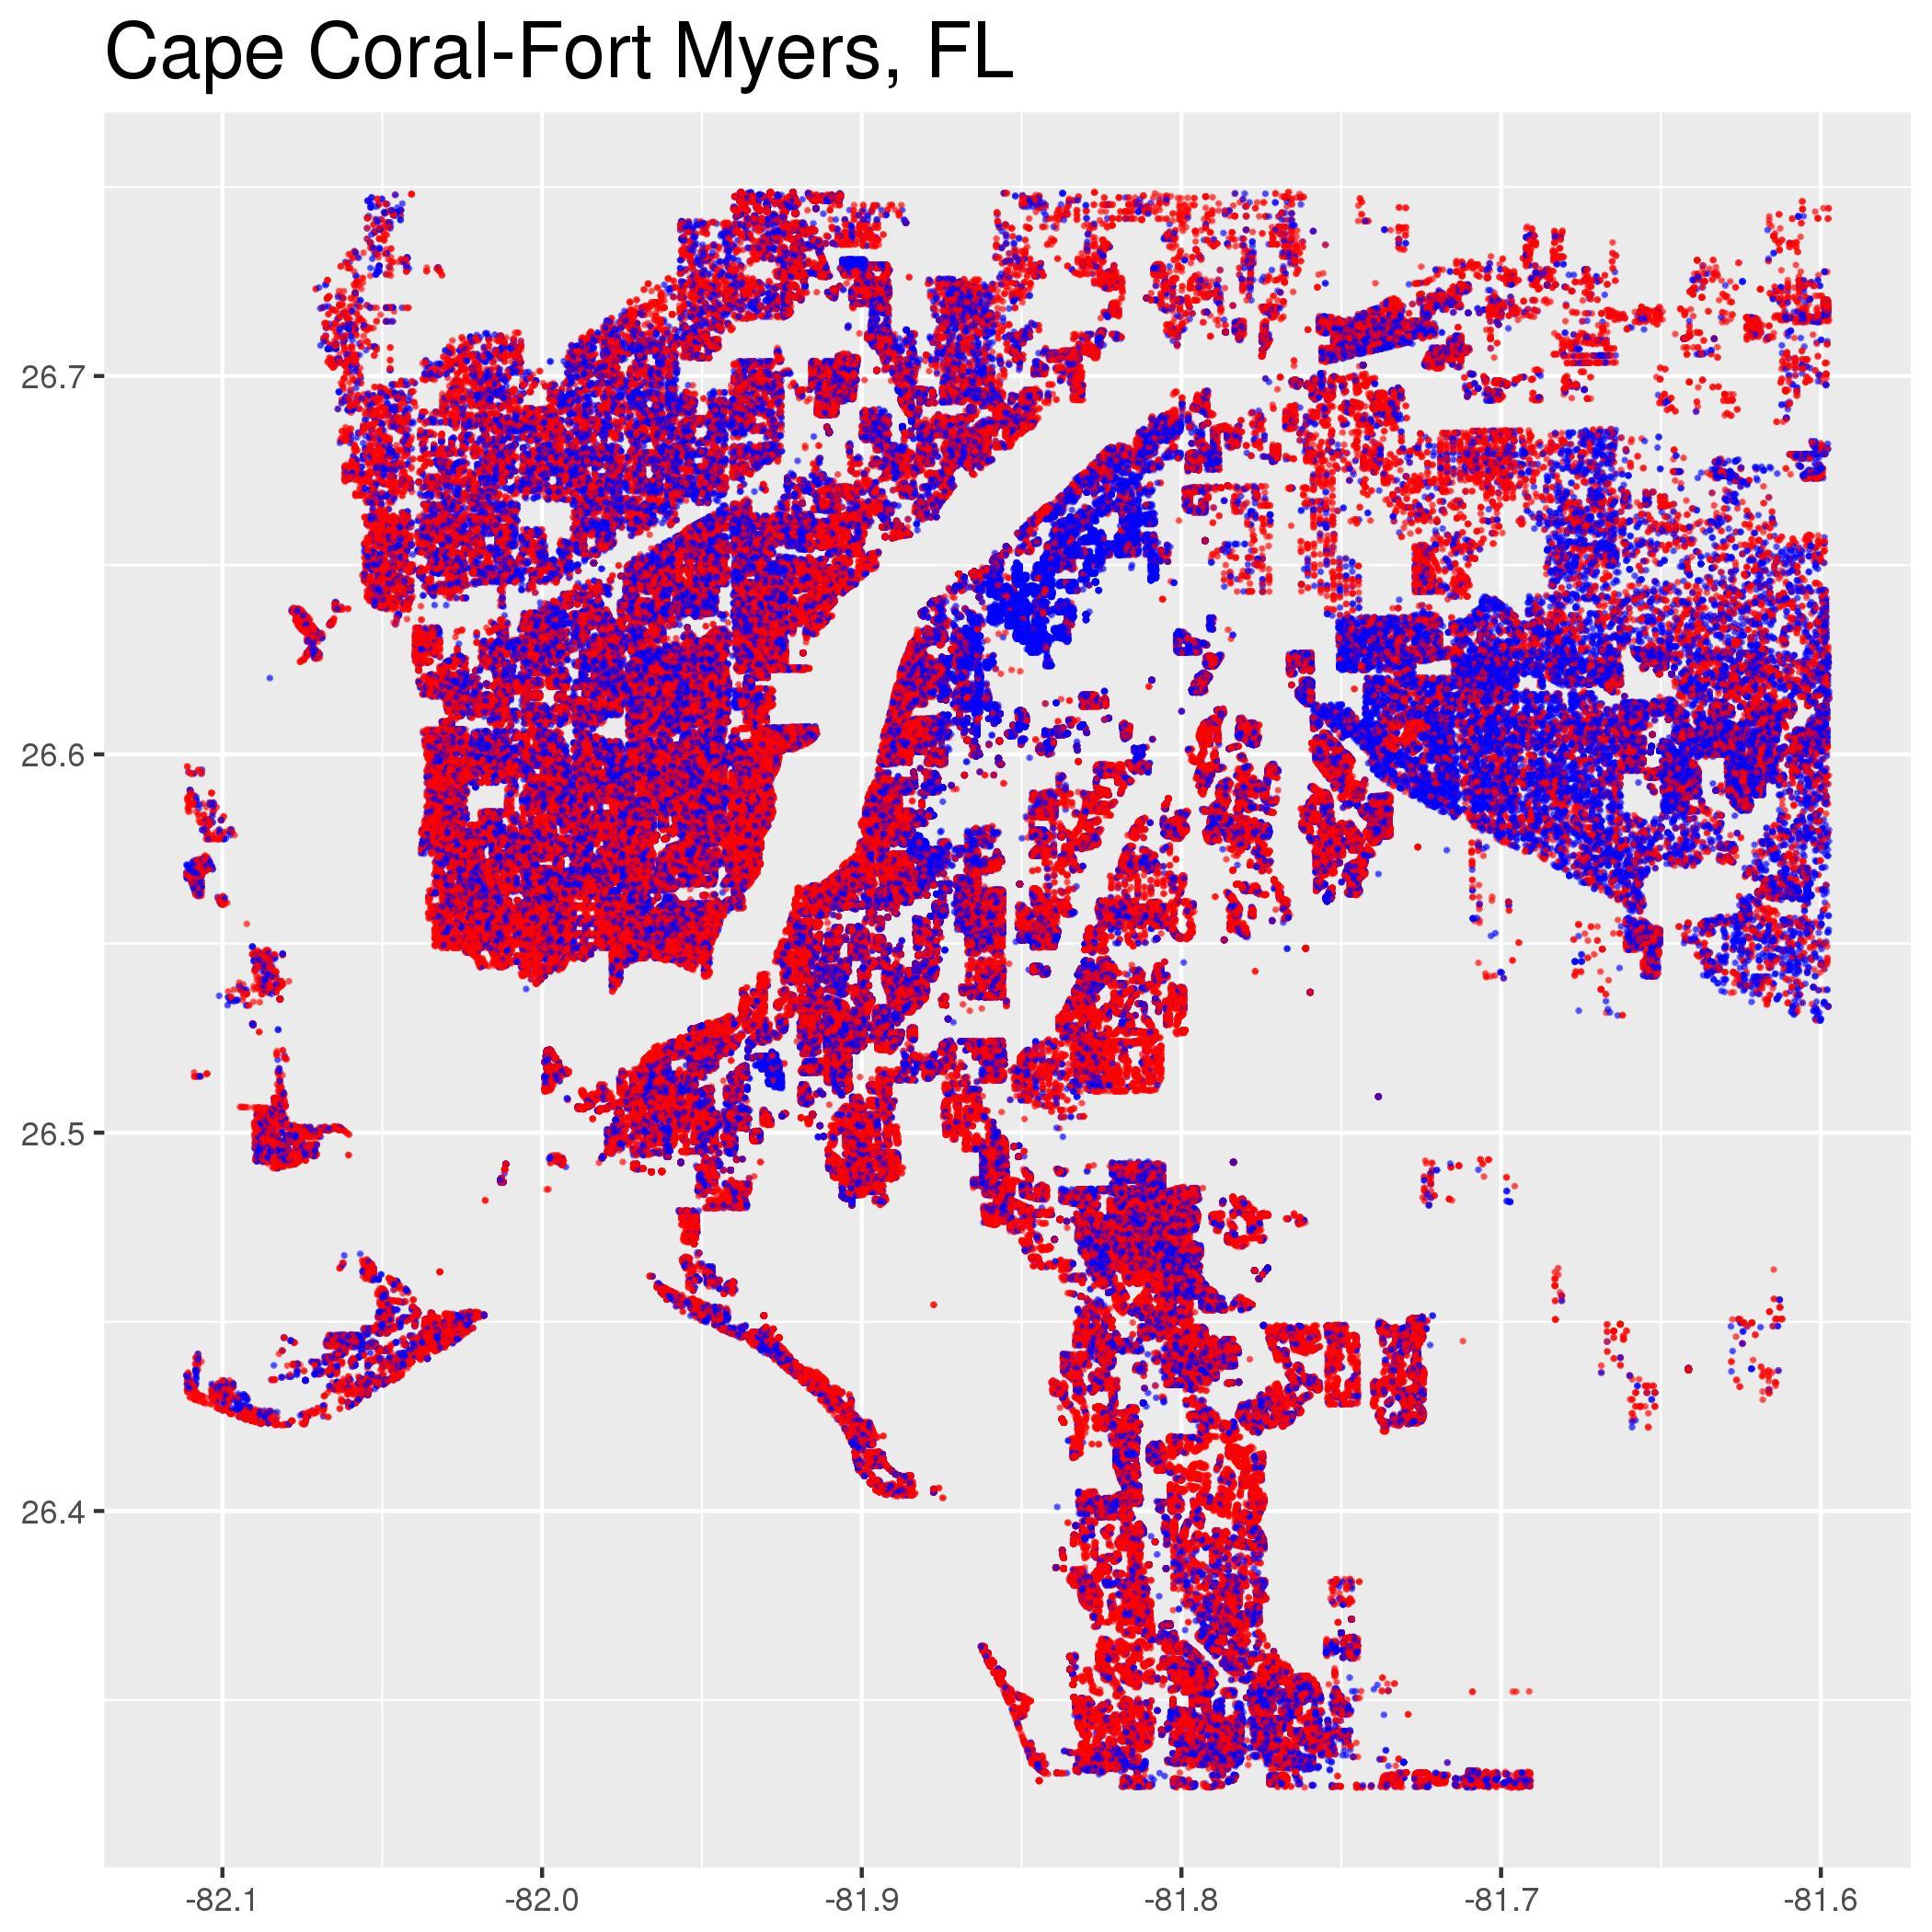 CapeCoral-FortMyersFL.jpeg